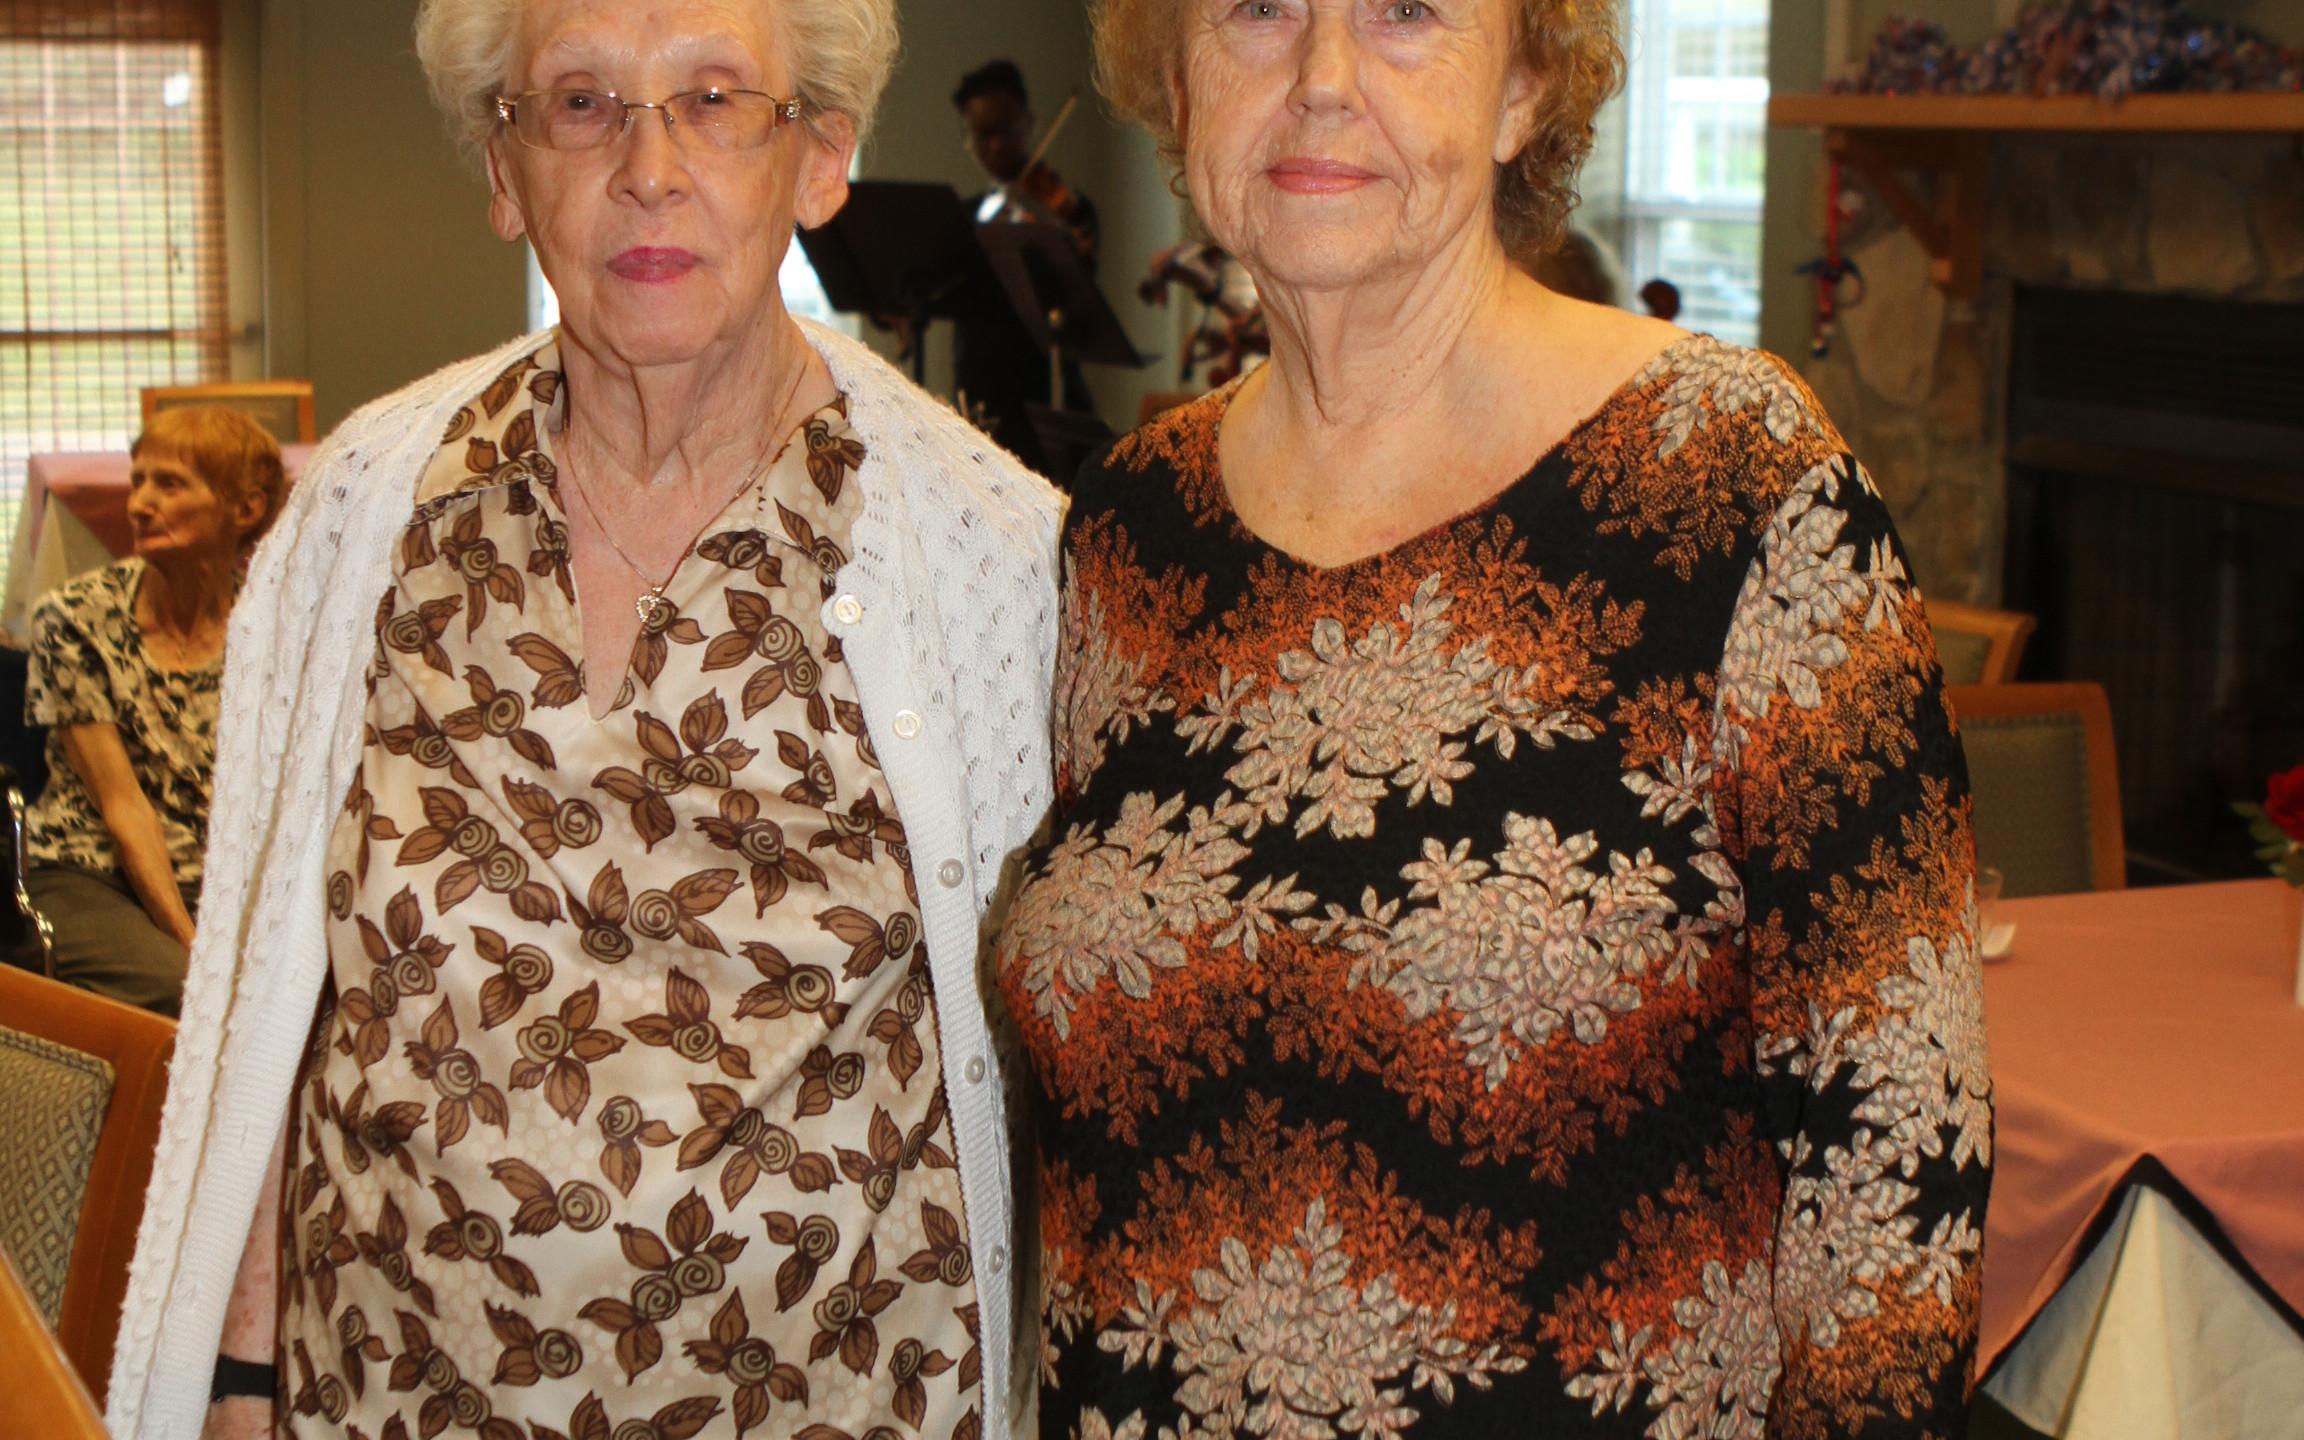 Mary Joiner, Carolyn Blick